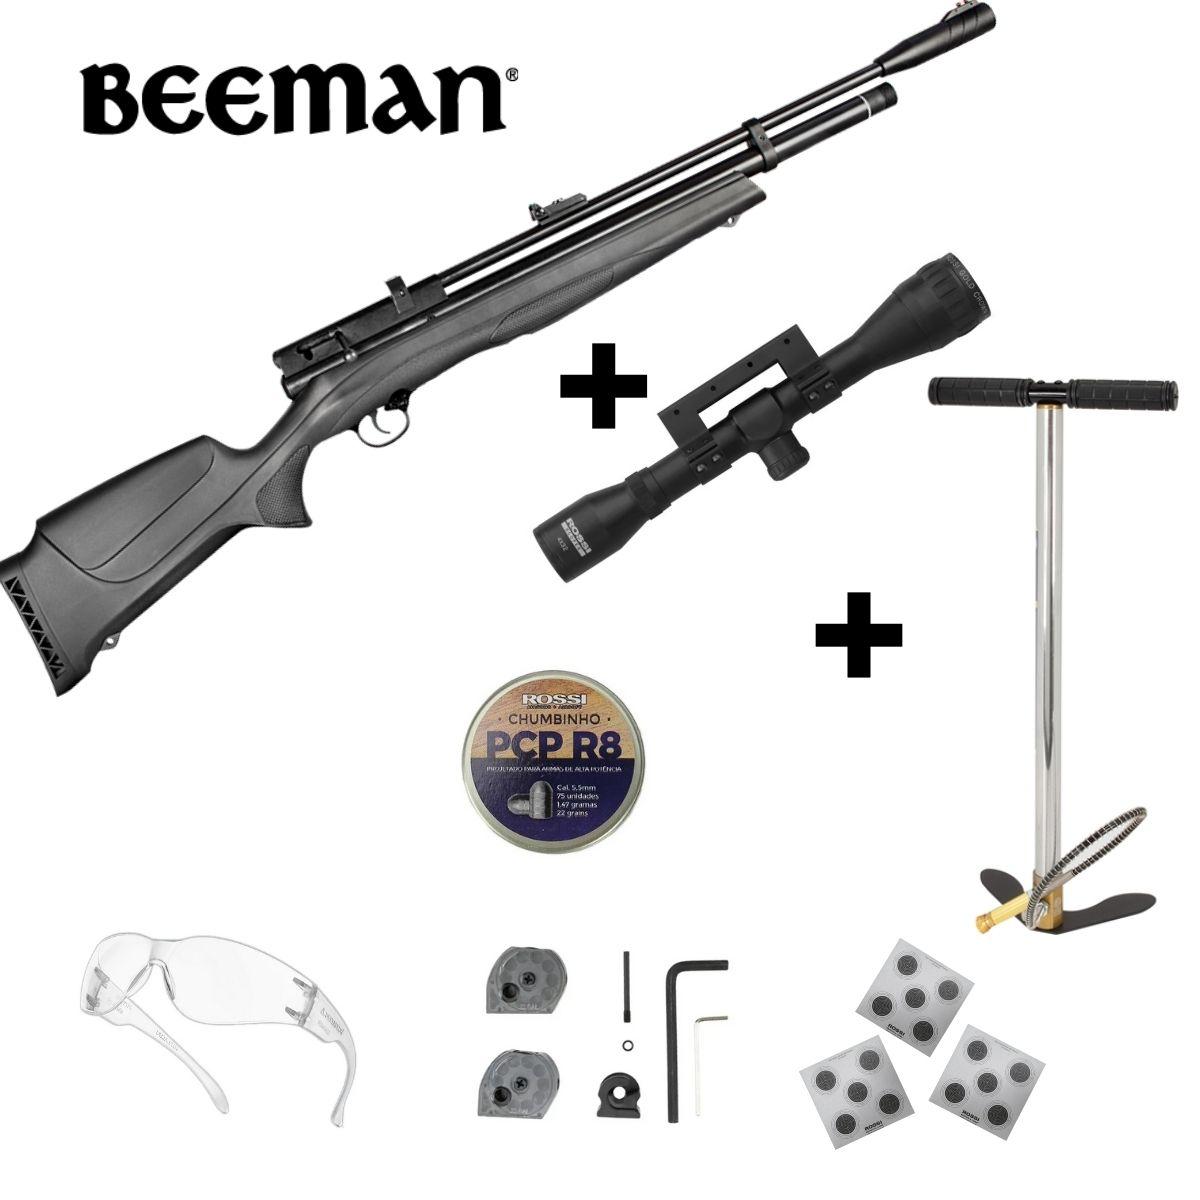 Carabina Pressão Rossi Beeman Pcp 1336 5.5 Kit Luneta Bomba